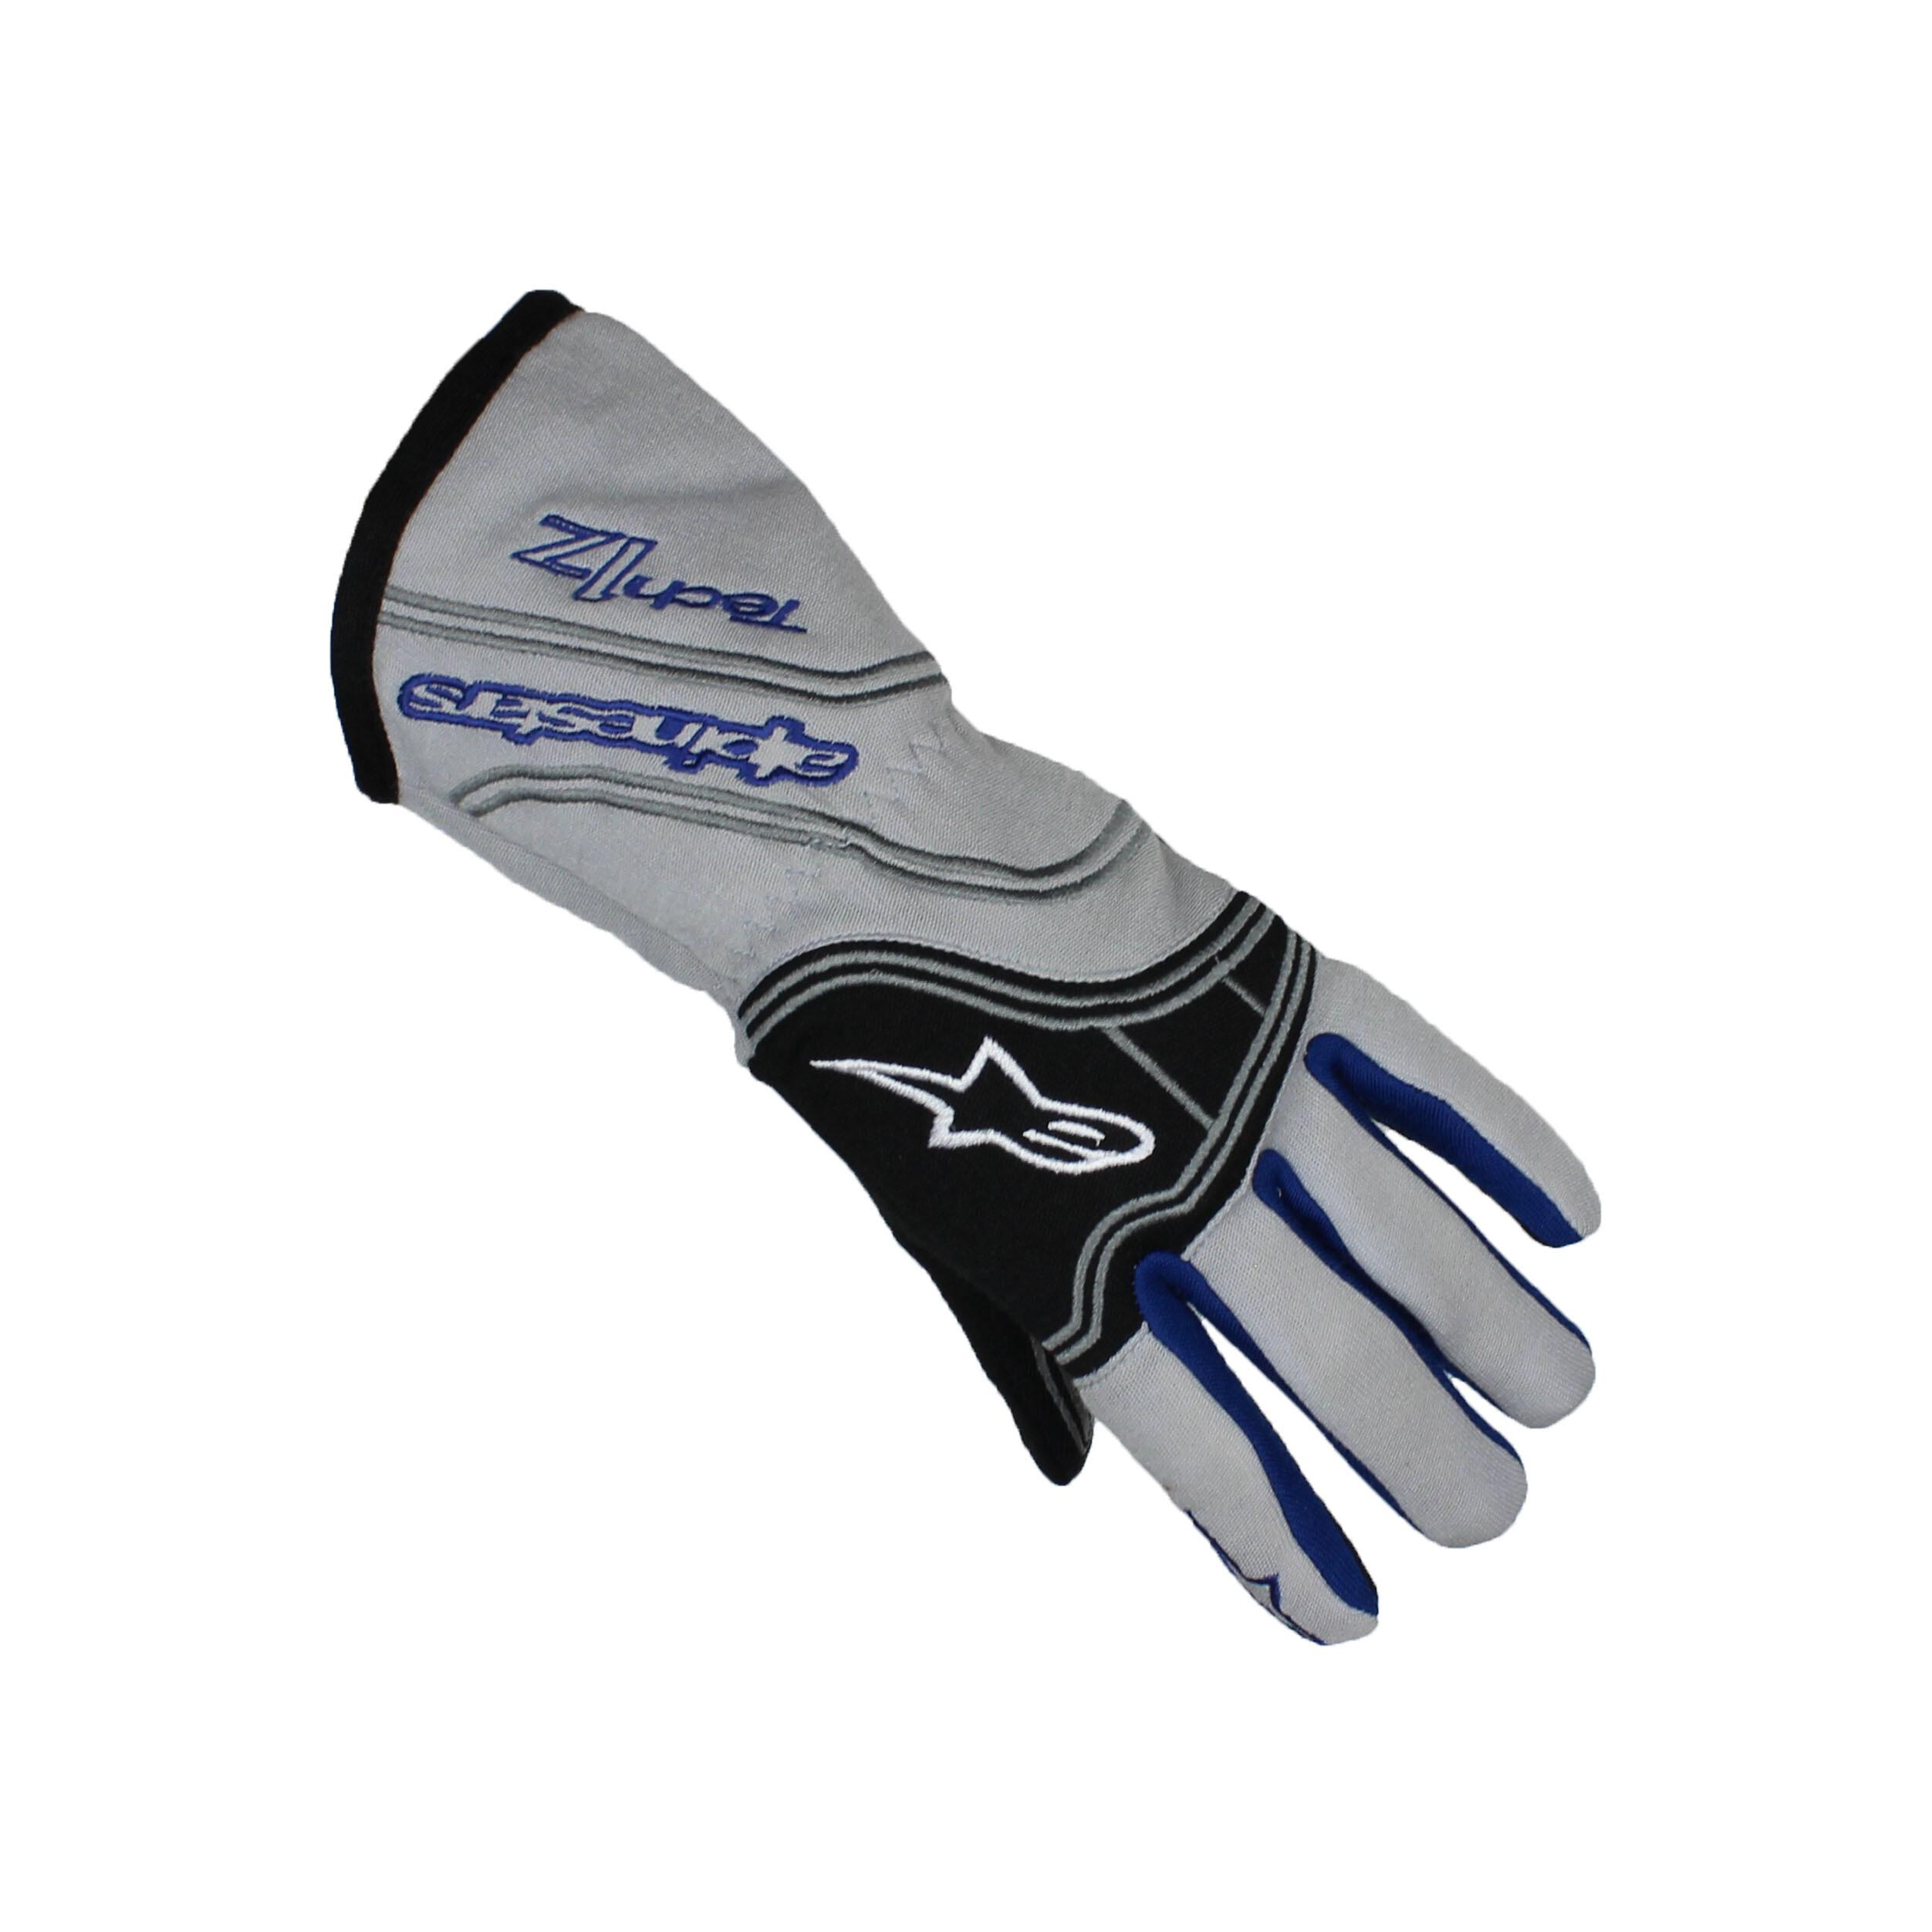 Alpinestars TECH 1-Z FIA Karting Gloves Silver/Blue